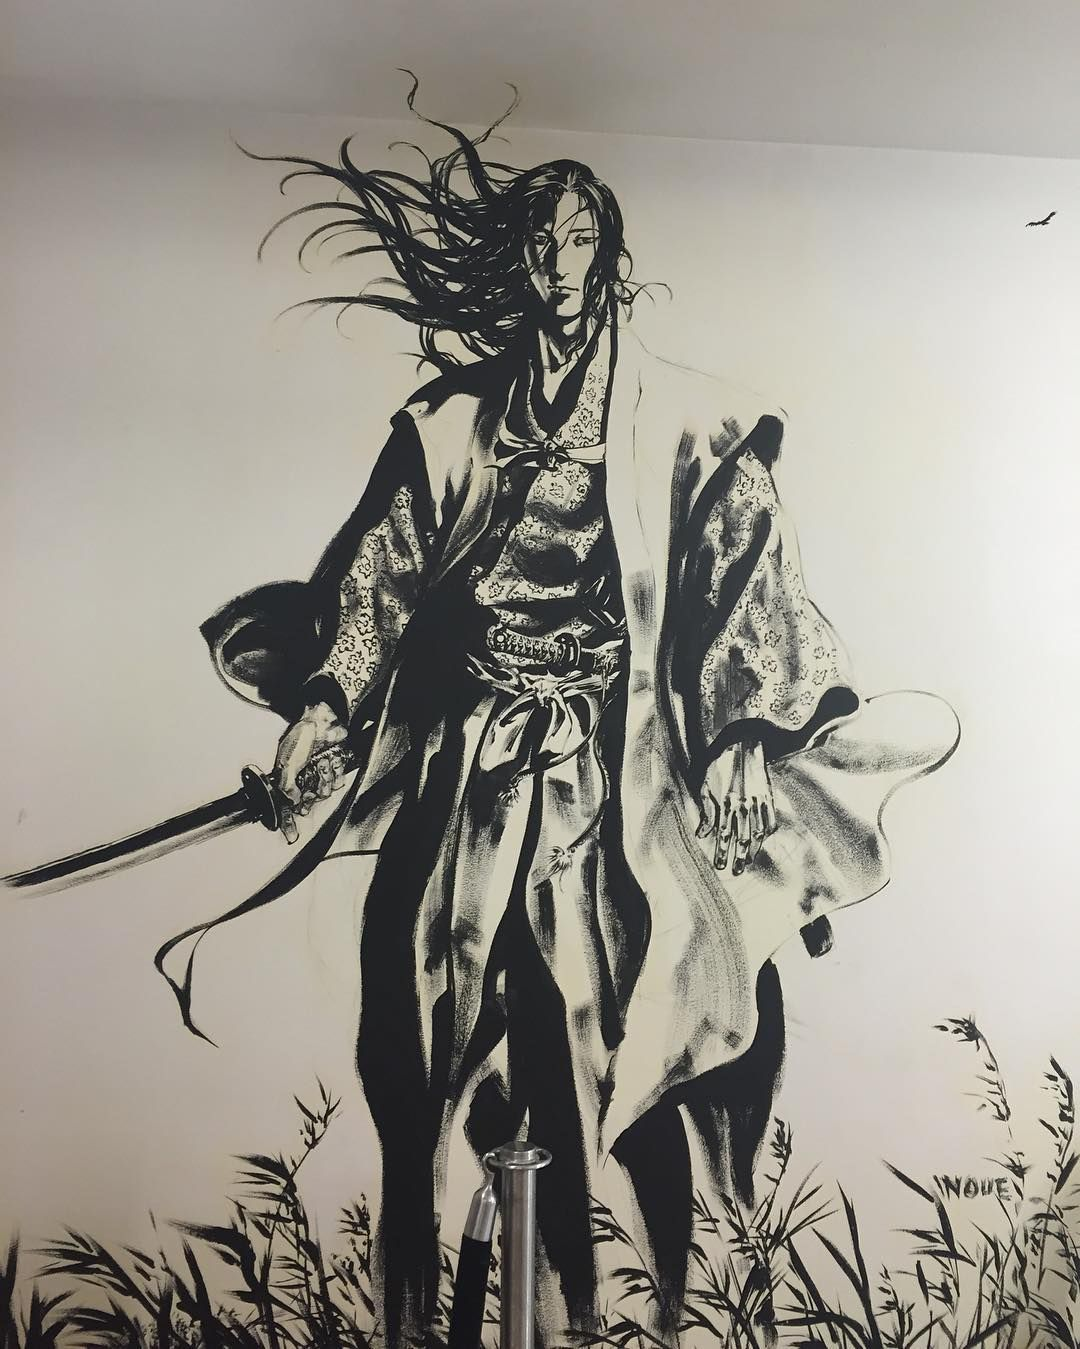 Awesome Wall Painting Wall Kinokuniyabookstore Japan Japanese